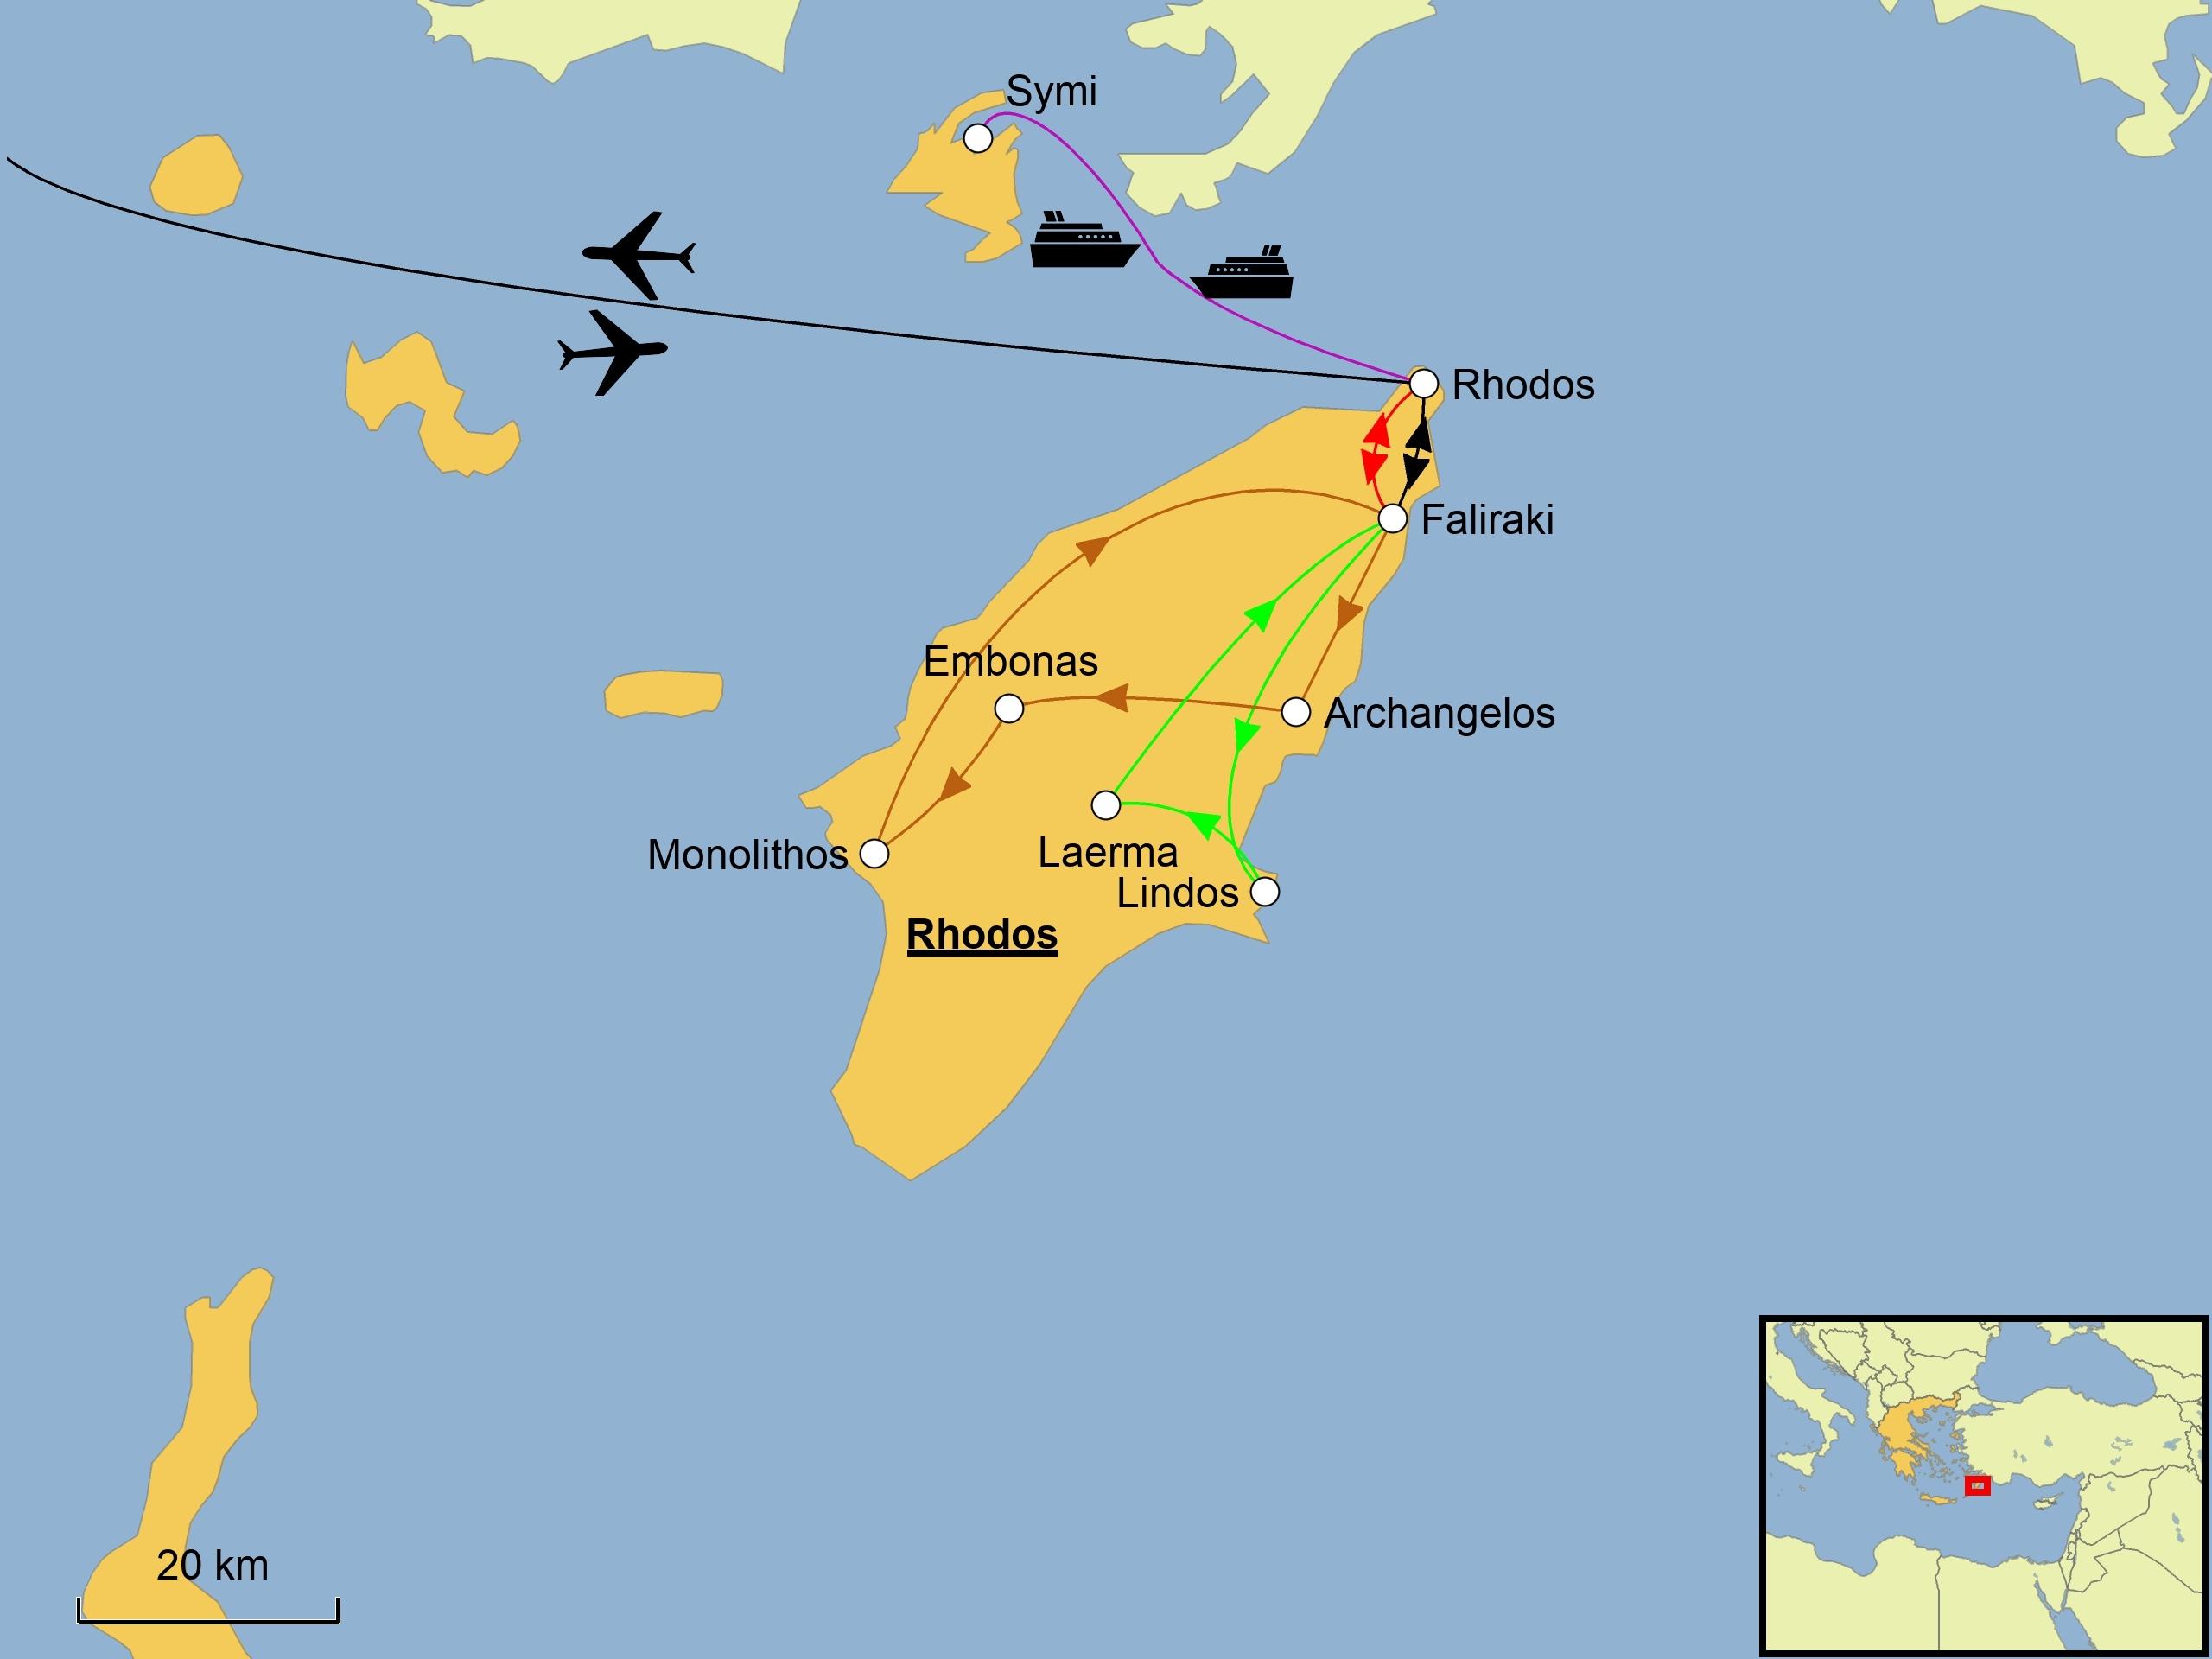 Rhodos Karte Flughafen.Rhodos